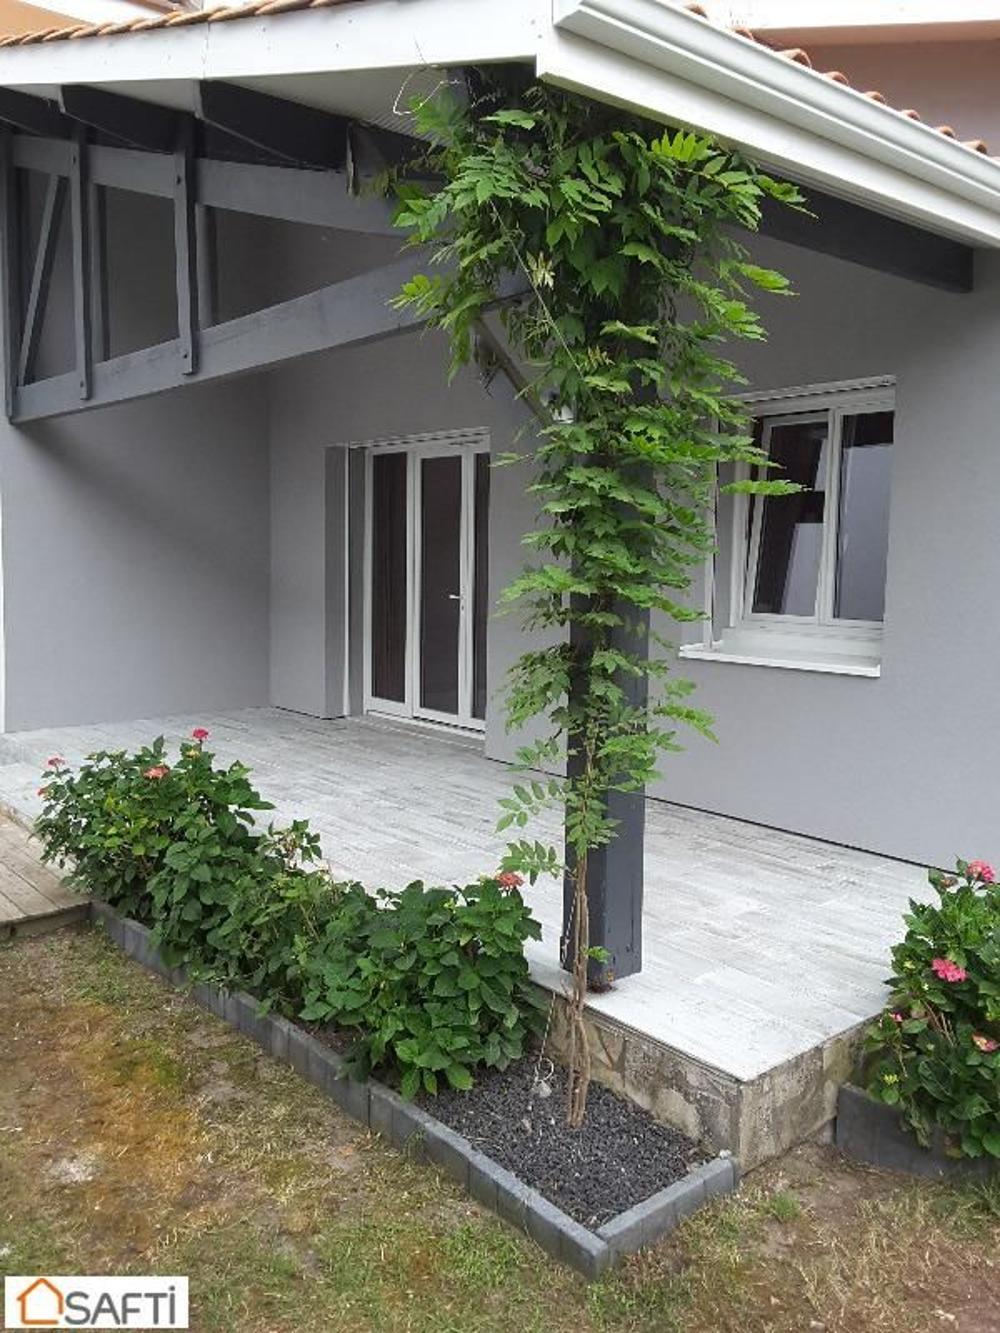 Vendays-Montalivet Gironde Haus Bild 3459844